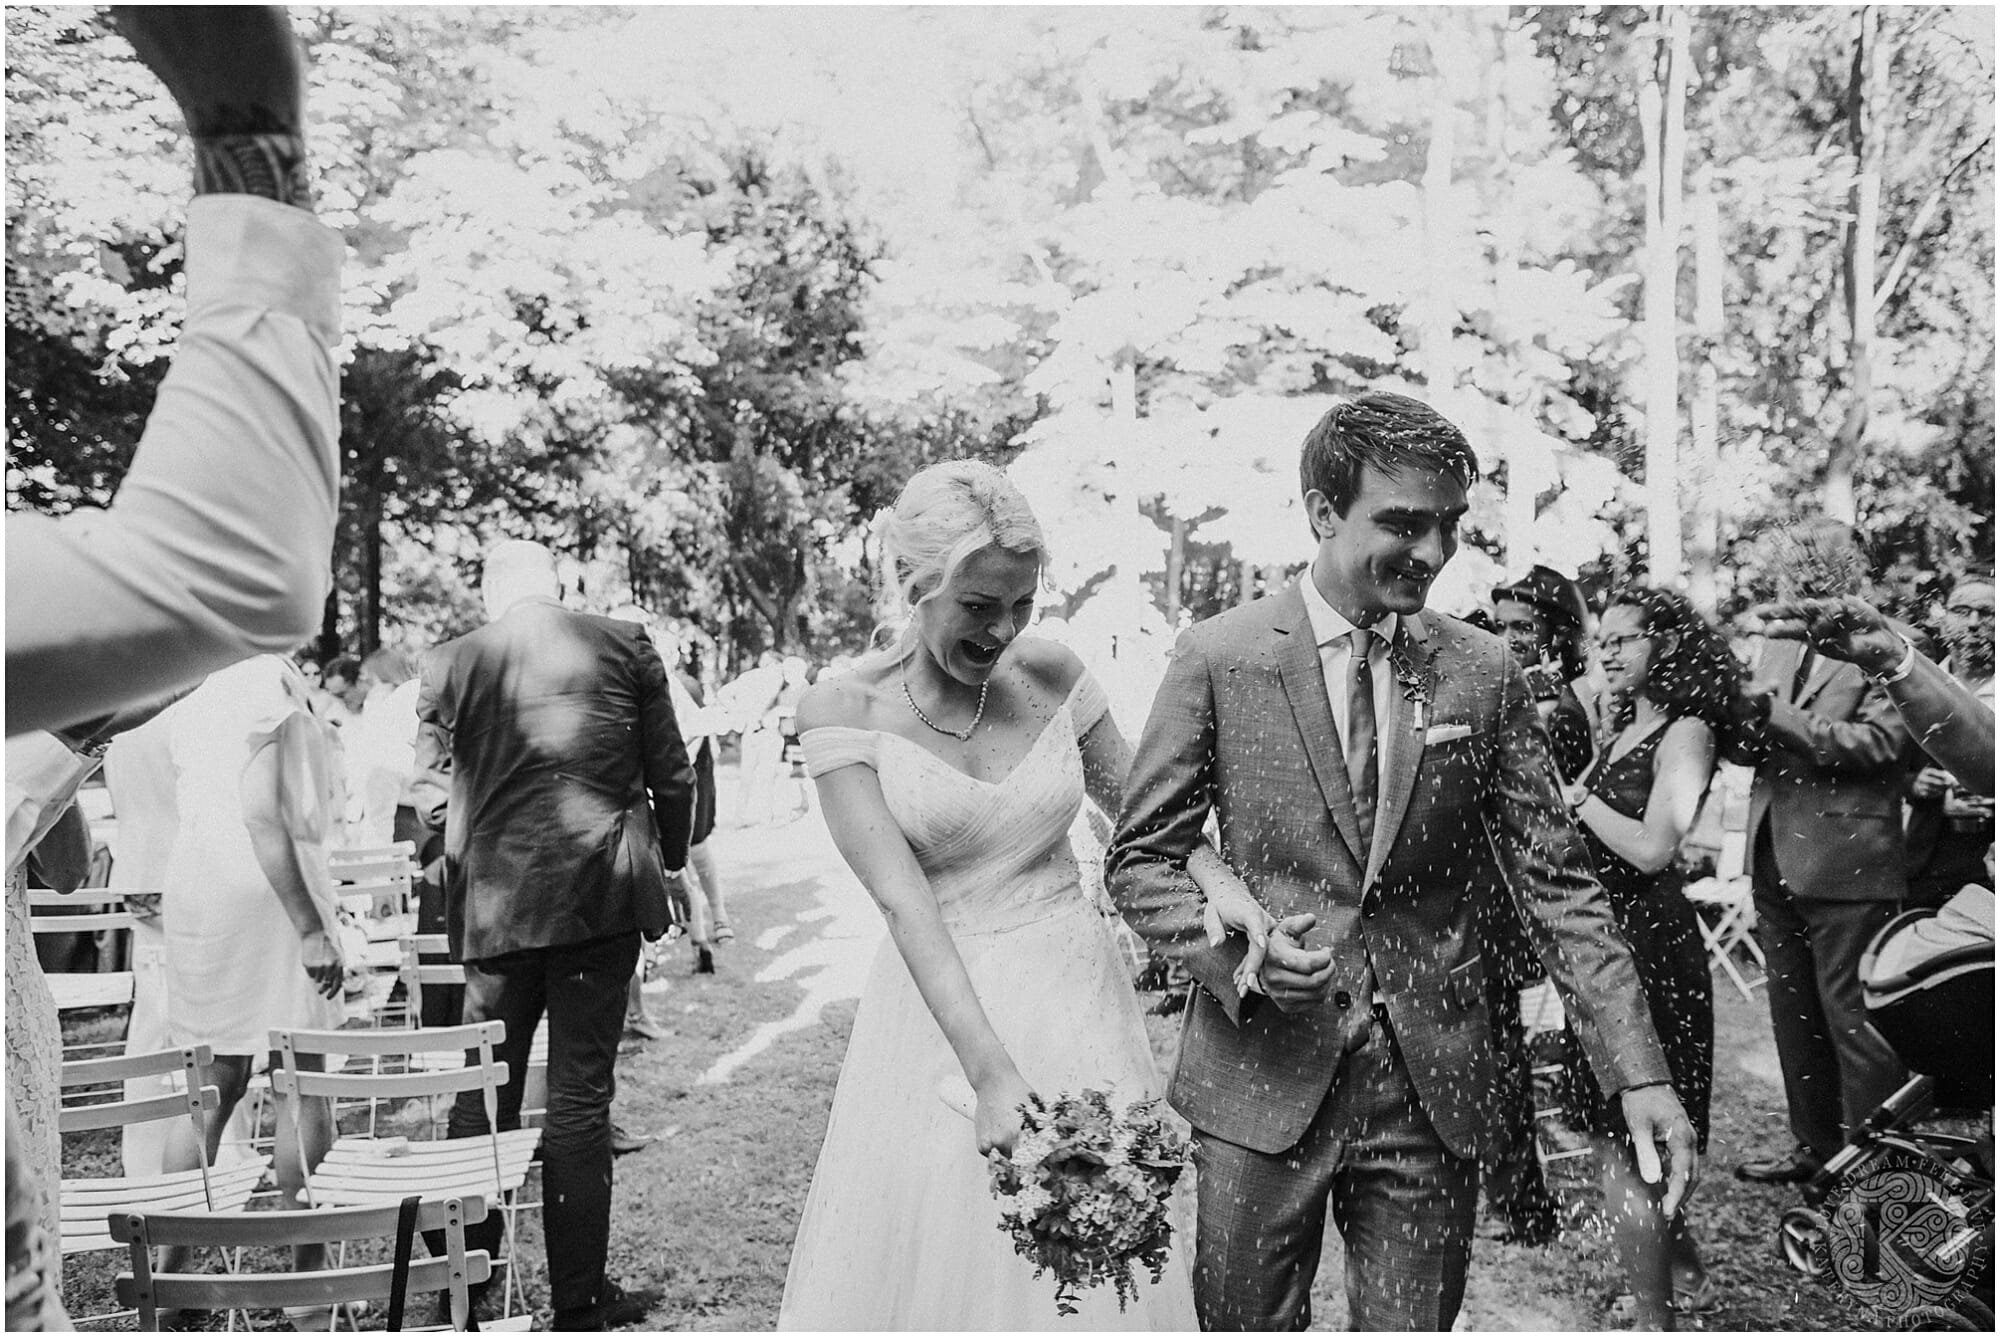 Kateryna-photos-photographe-mariage-chateau-des-3-fontaines-provence-avignon-vaucluse-sud_0062.jpg